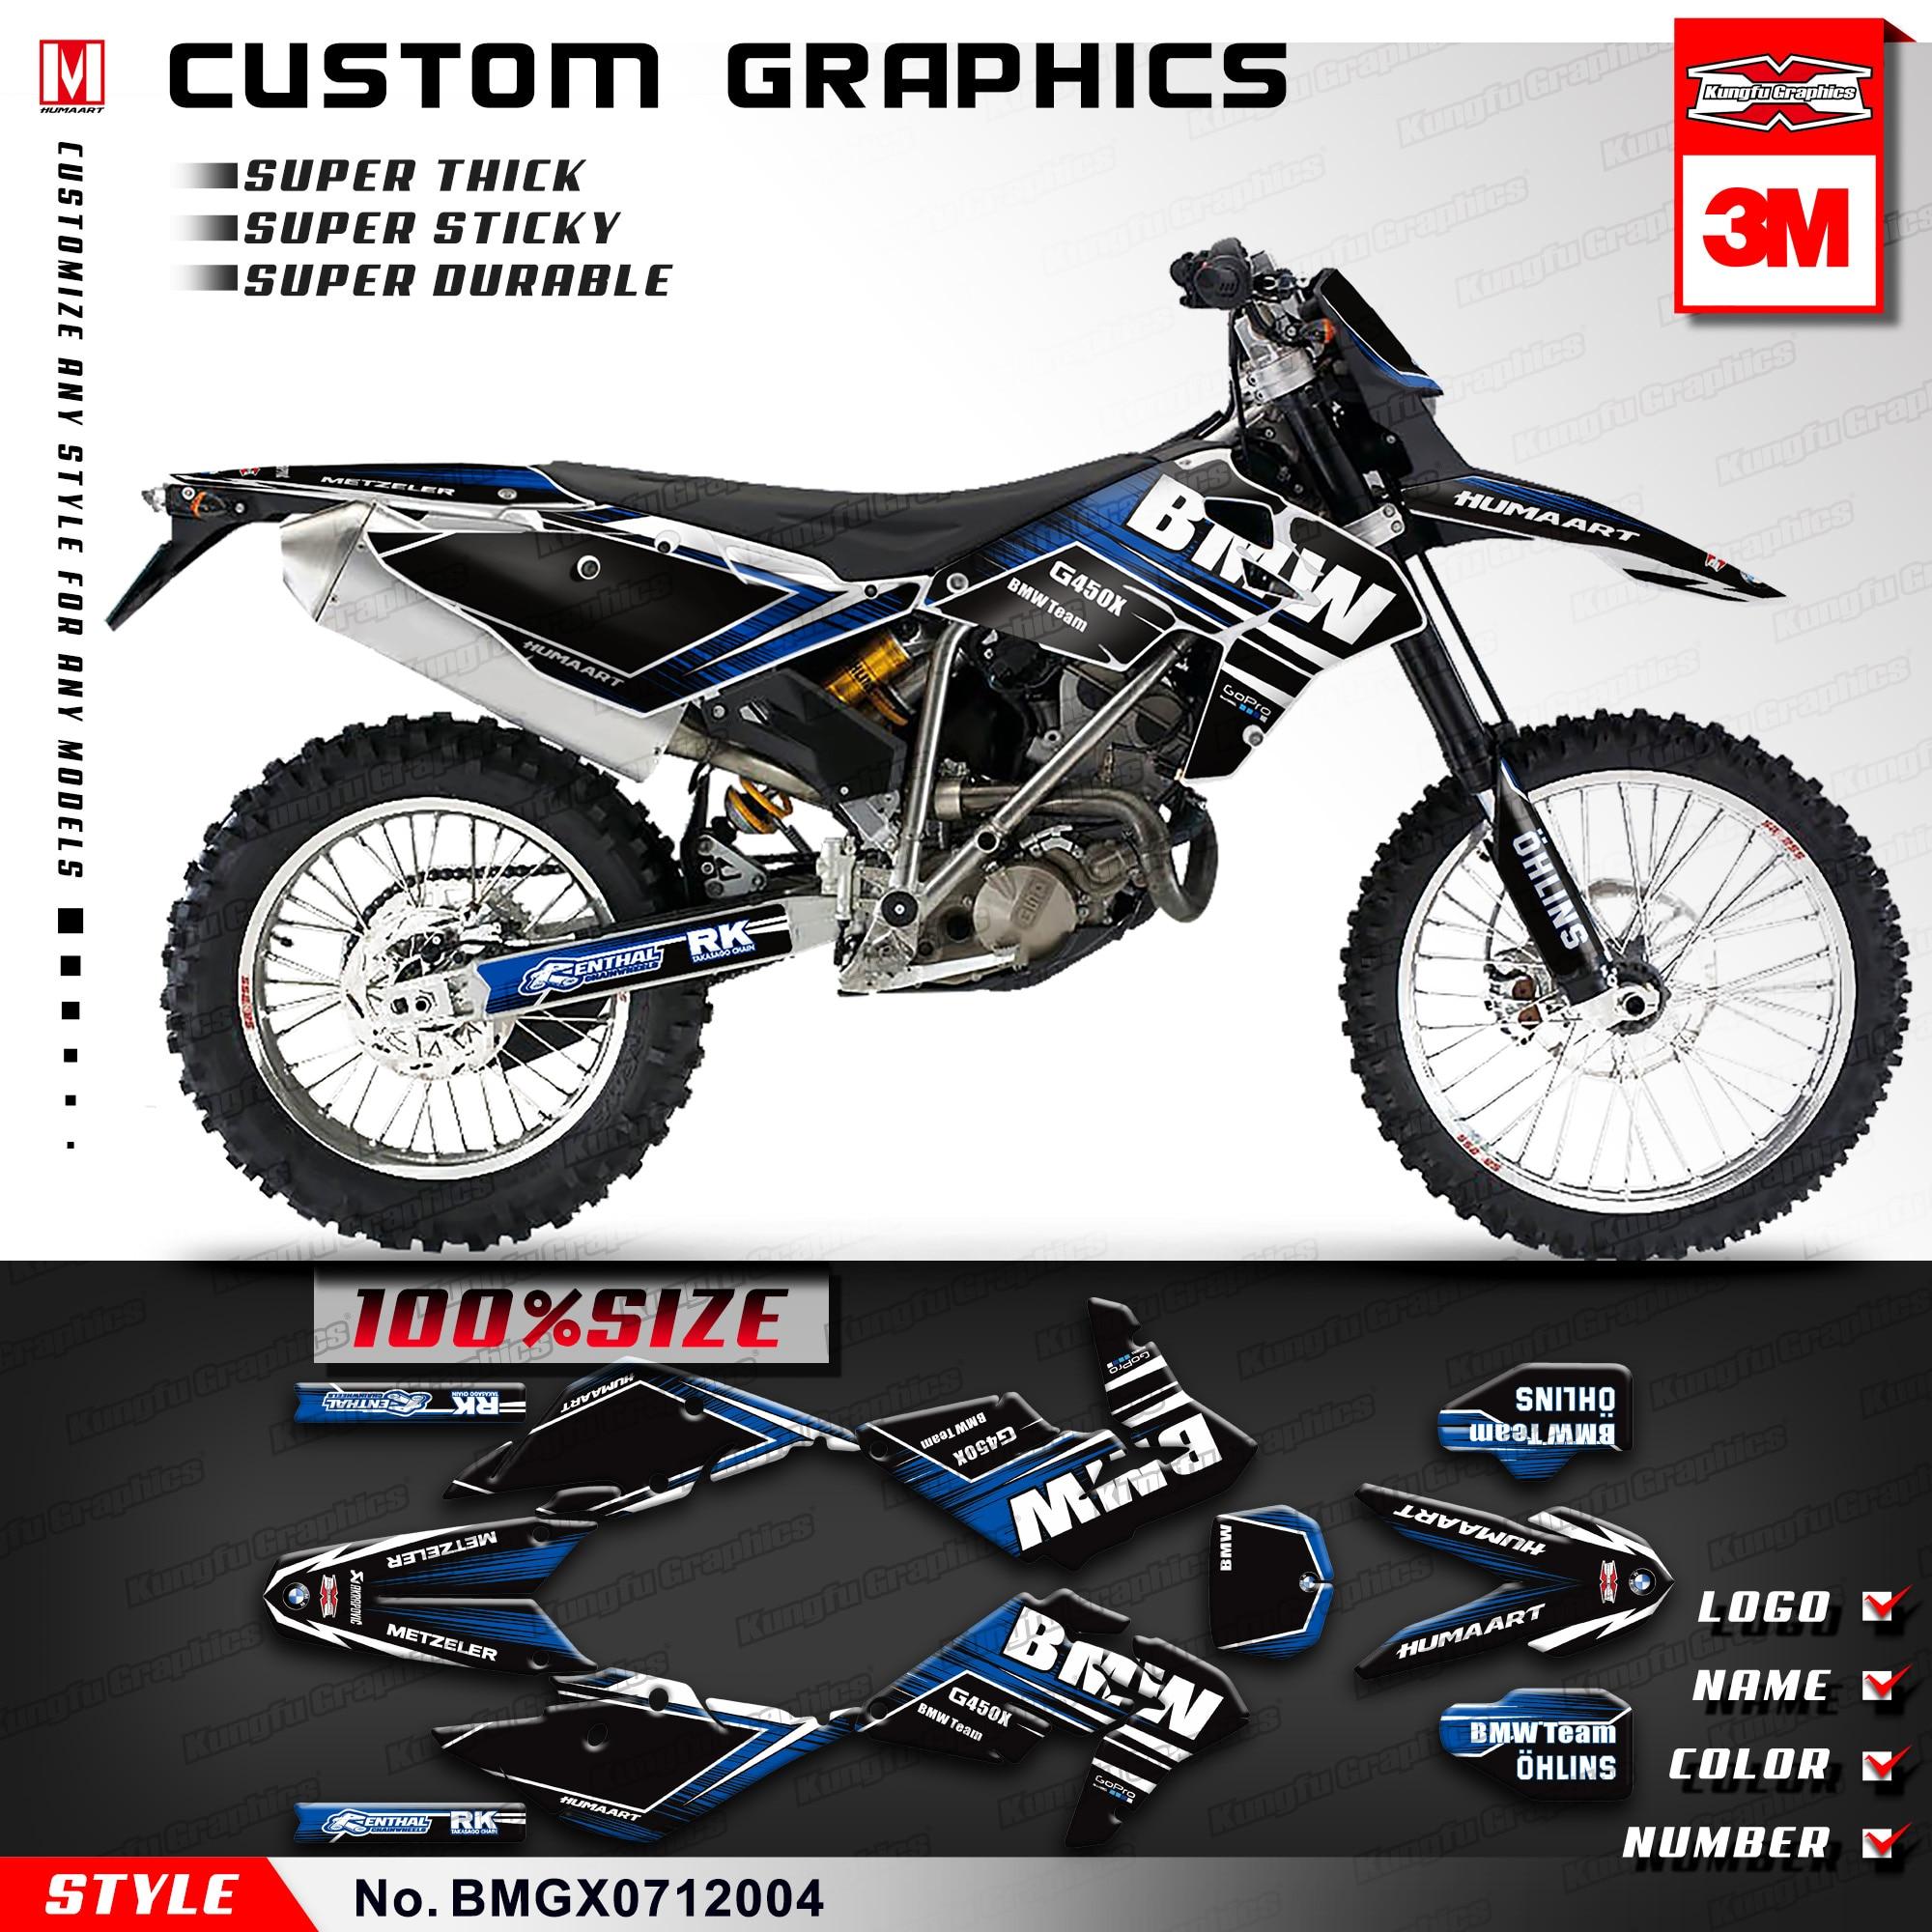 Kungfu graphics custom vinyl stickers dirt bike decals kit for bmw g450x 2007 2008 2009 2010 2011 2012 style no bmgx0712004